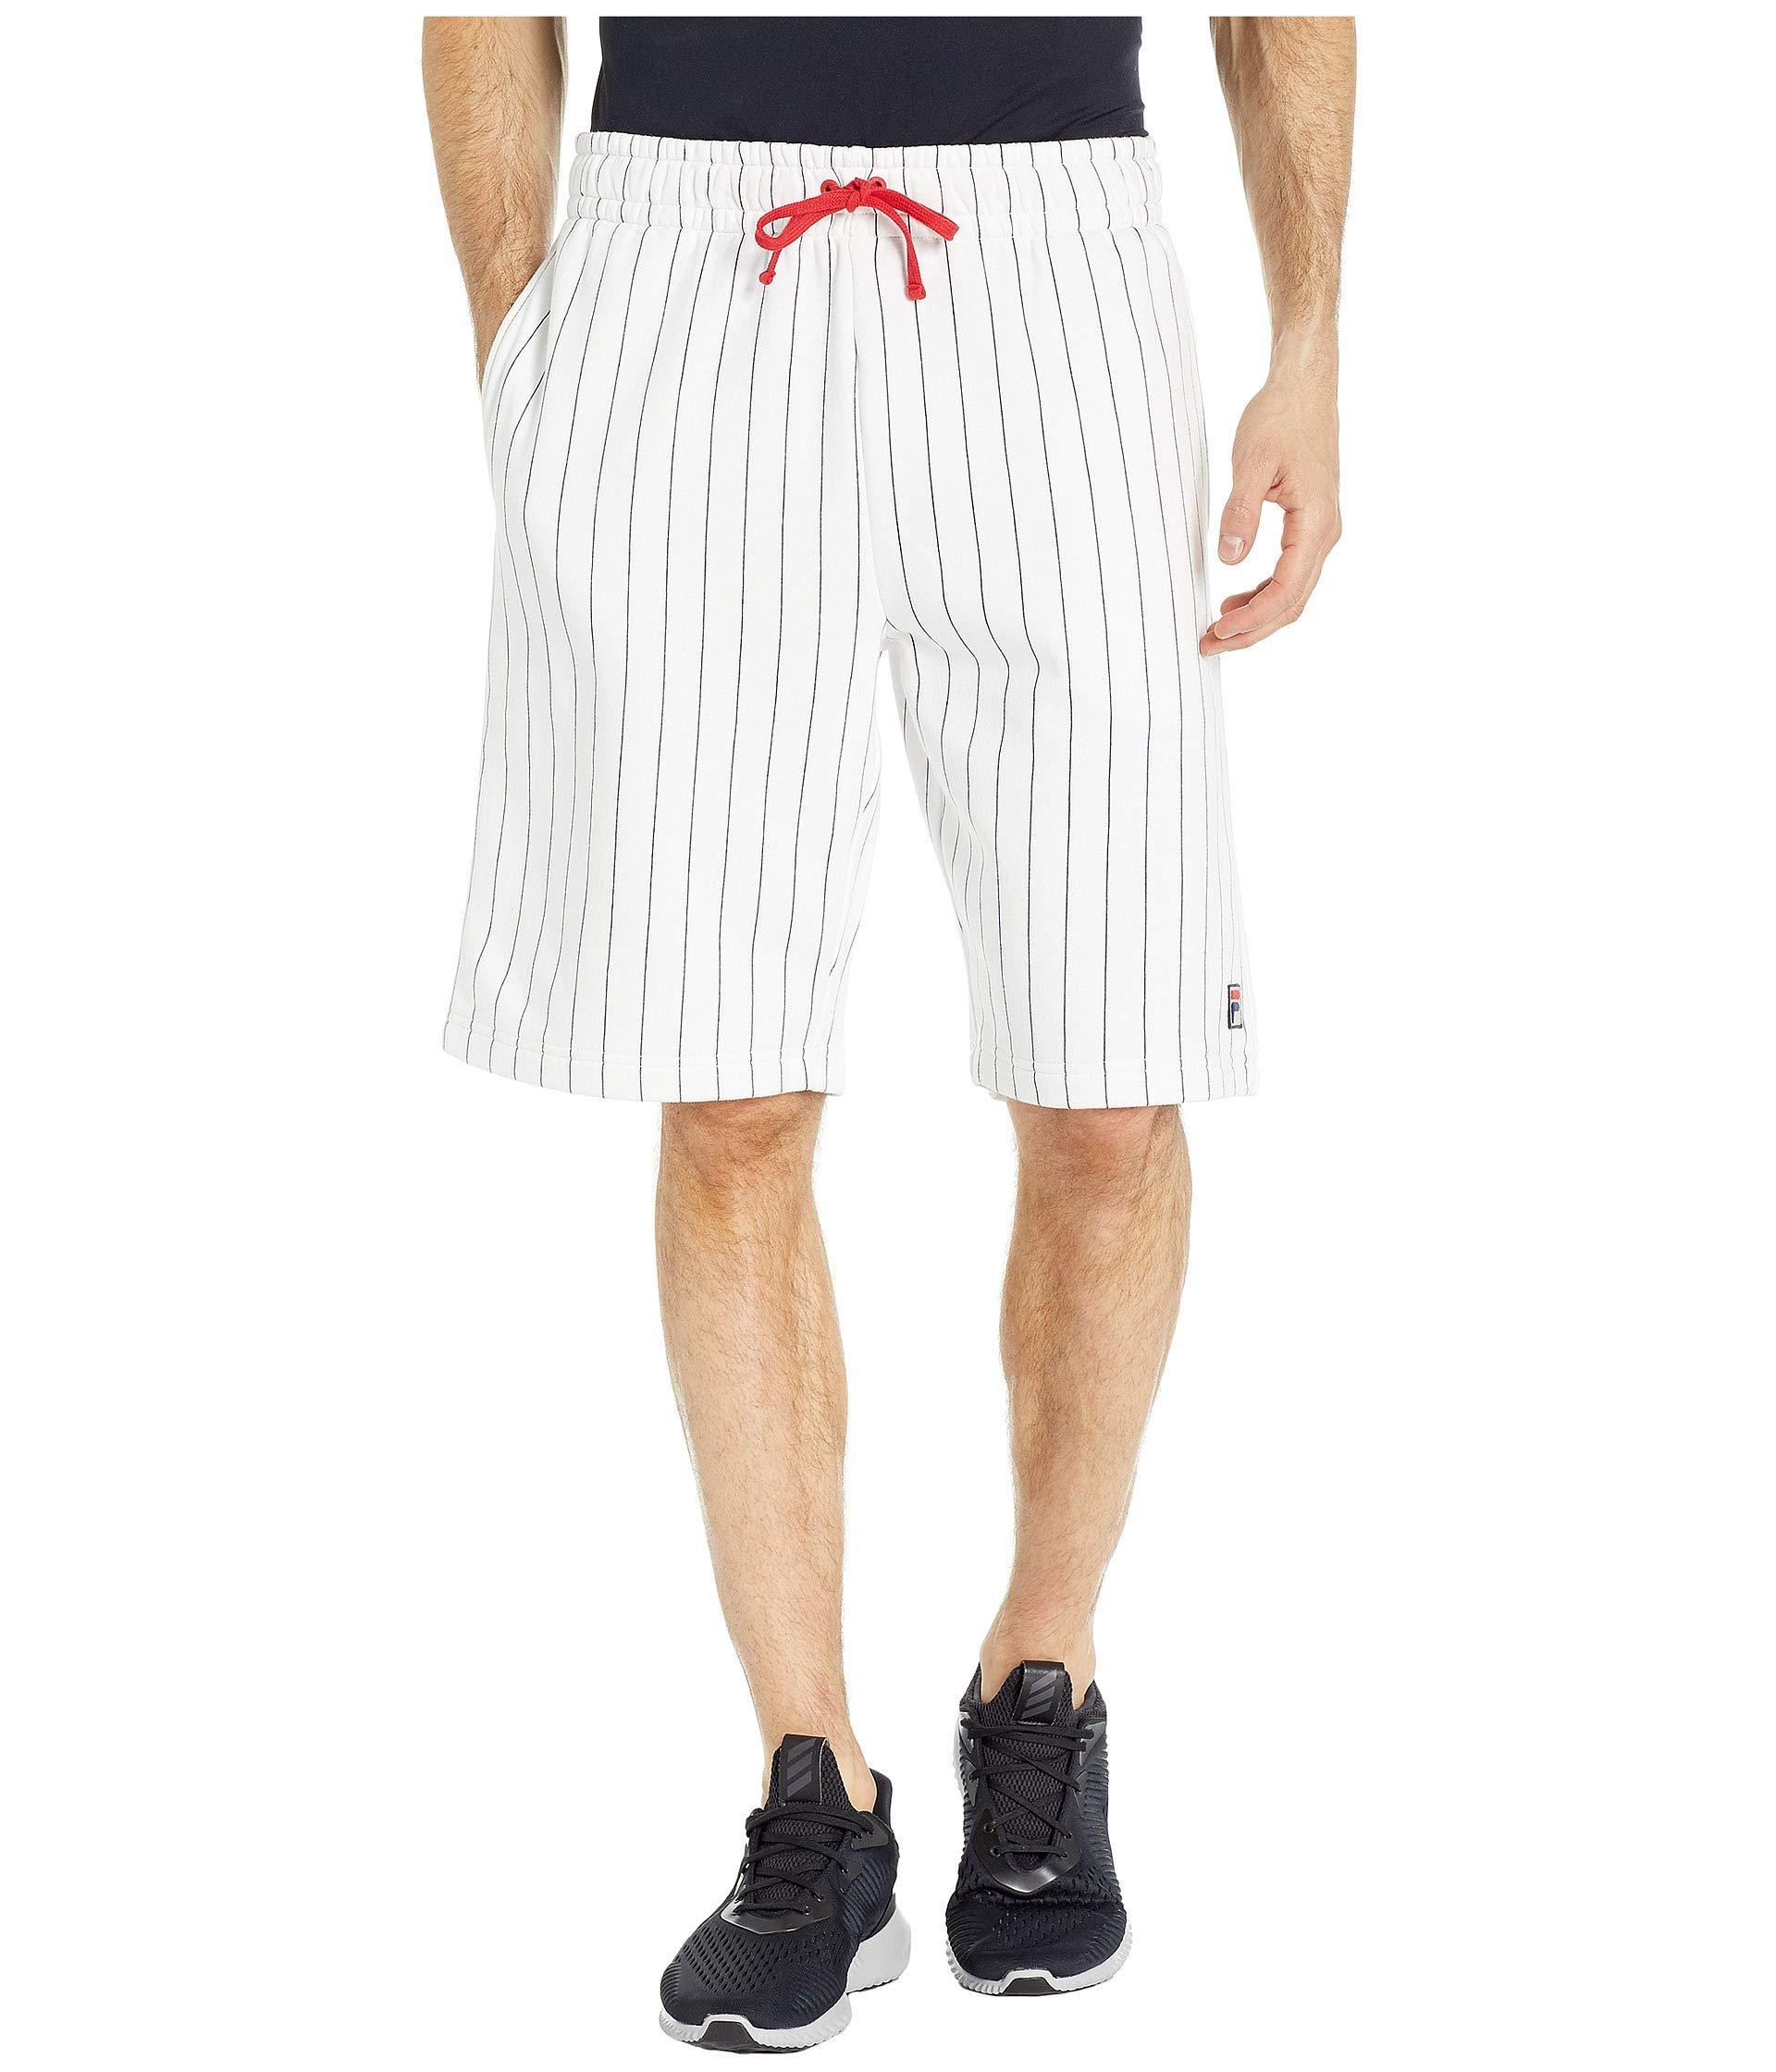 97703372b08db Lyst - Fila Bb1 Shorts (white/peach/chinese Red) Men's Shorts in ...